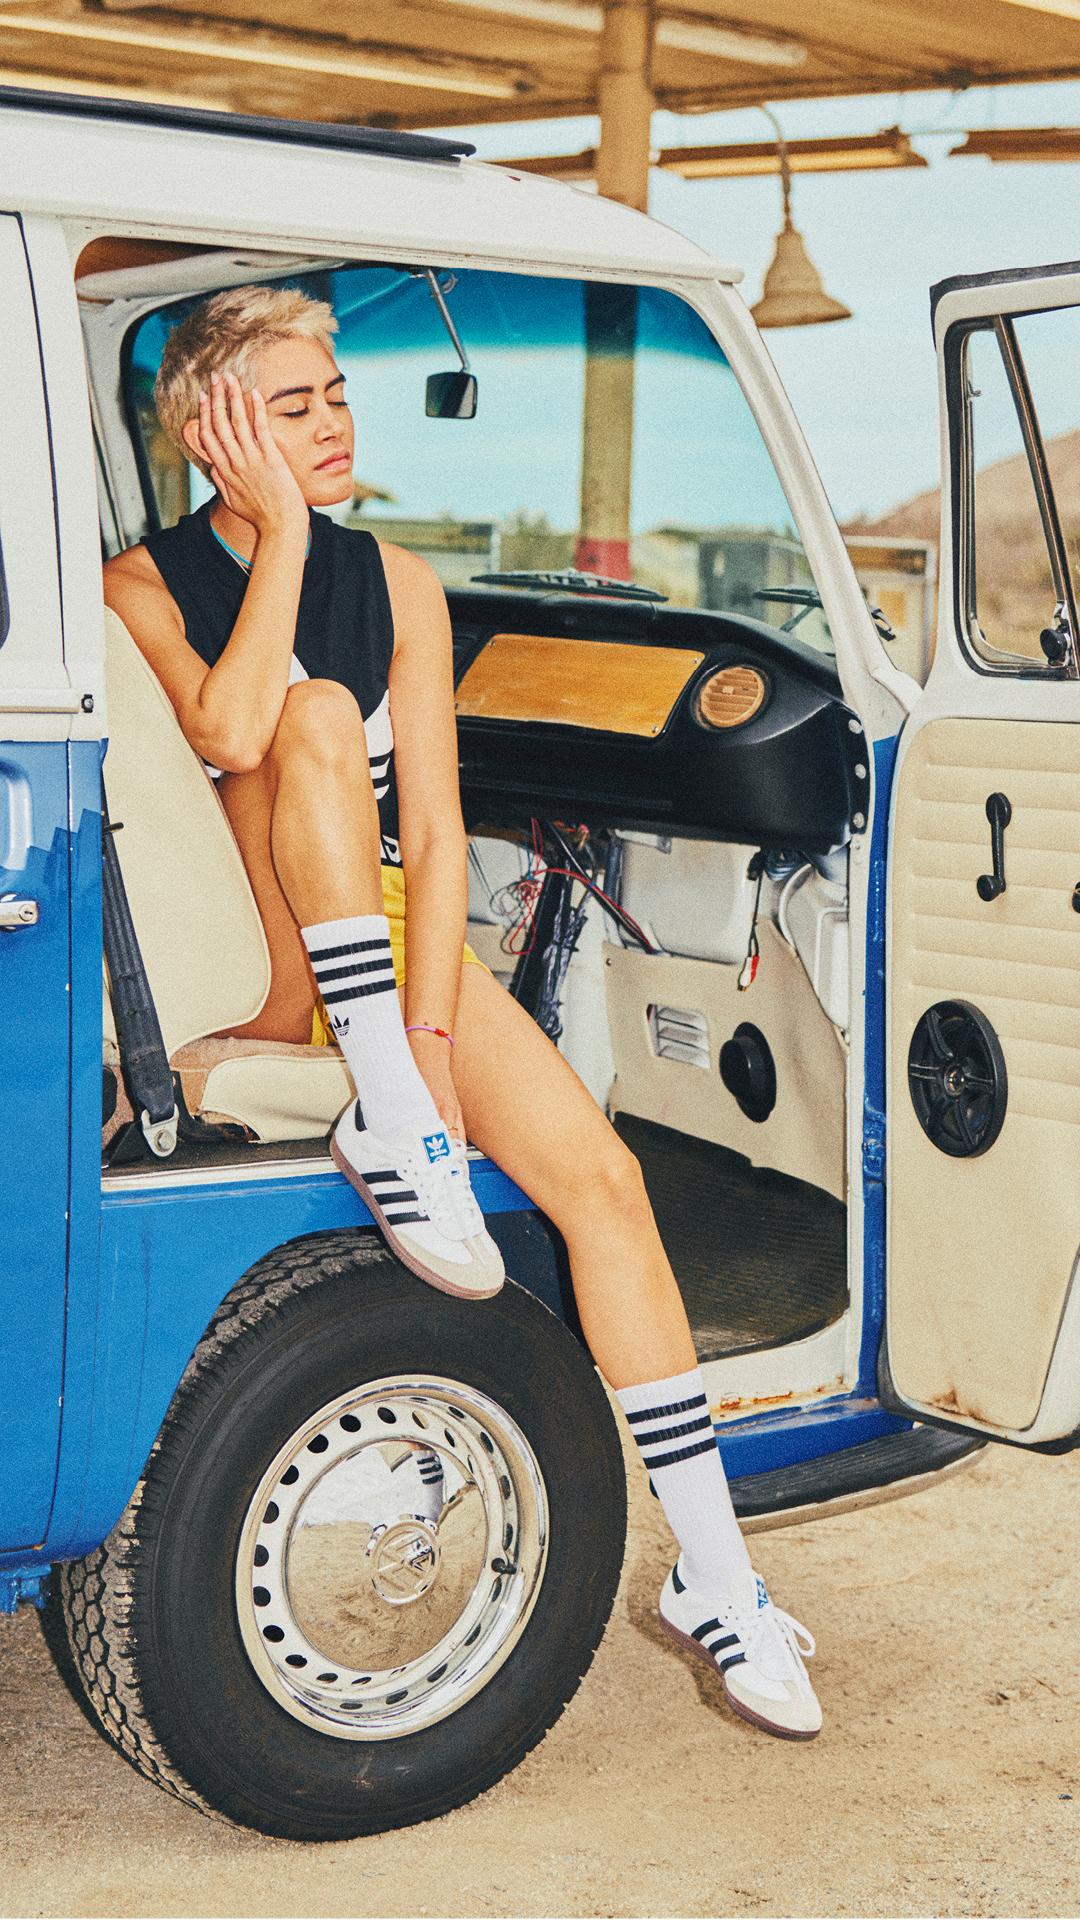 Princess Cyberspace Rebecca L'Amore For Adidas Originals